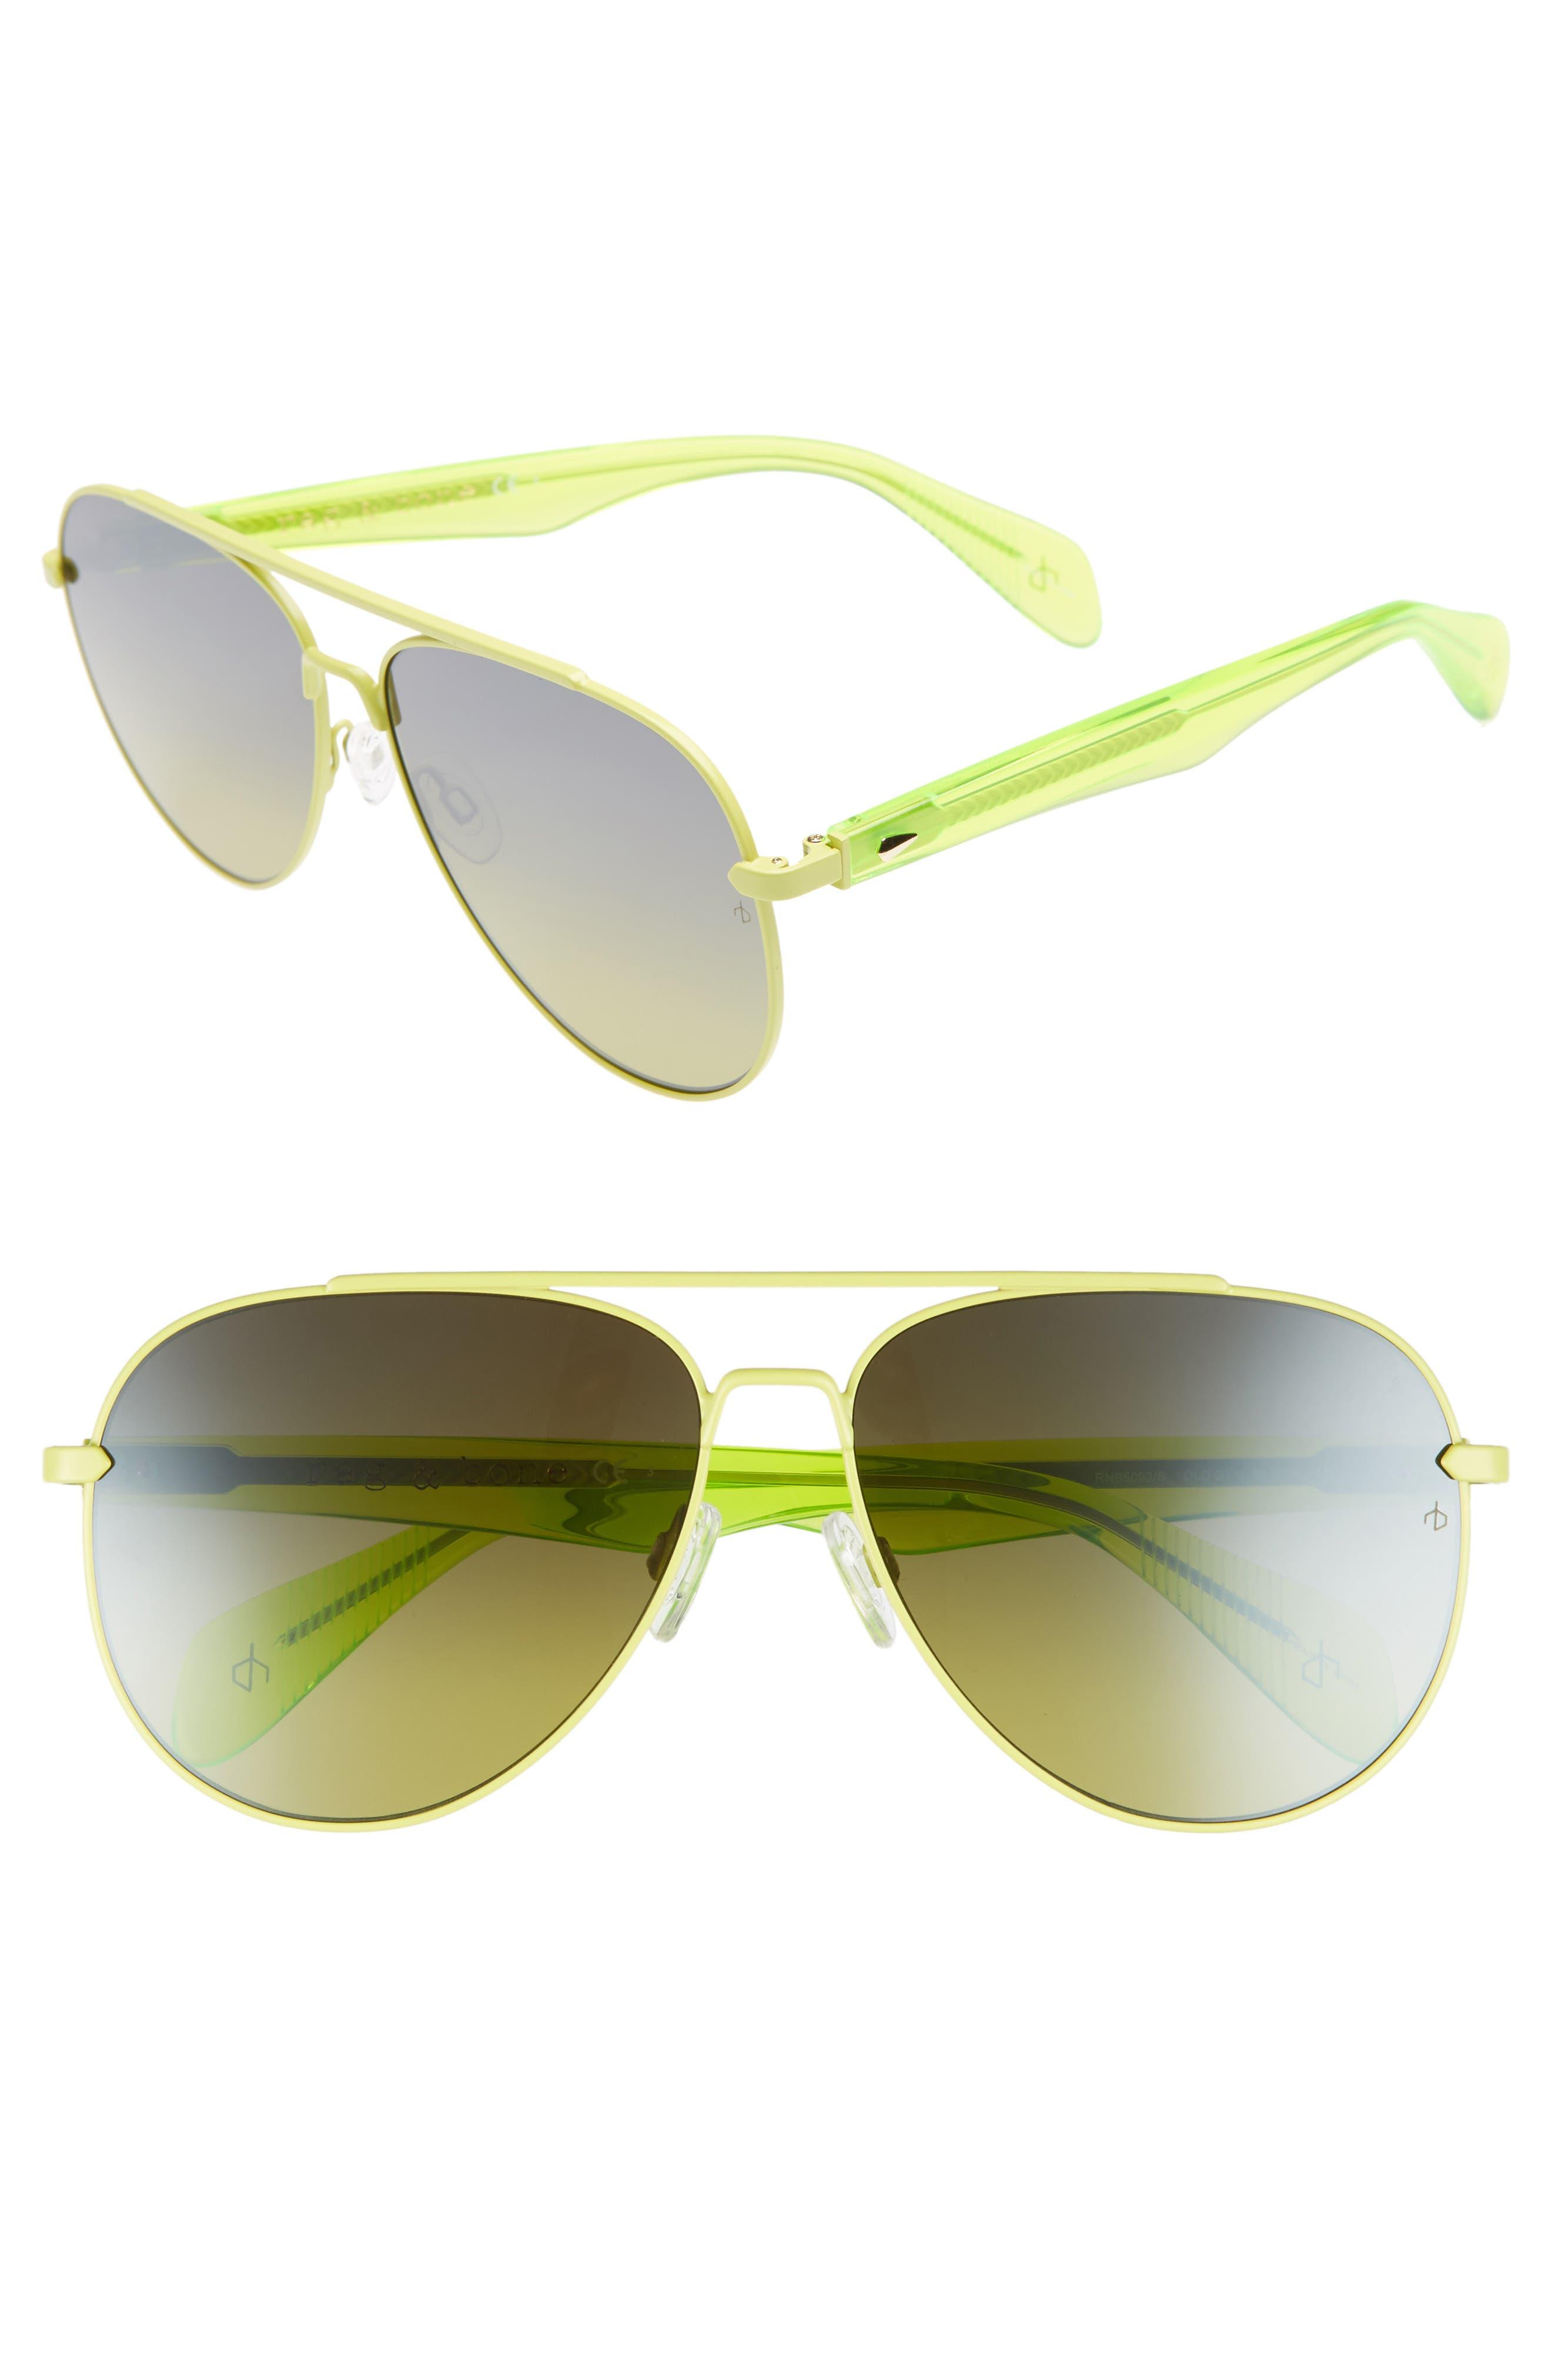 62mm Oversize Aviator Sunglasses,                         Main,                         color, MATTE GREEN